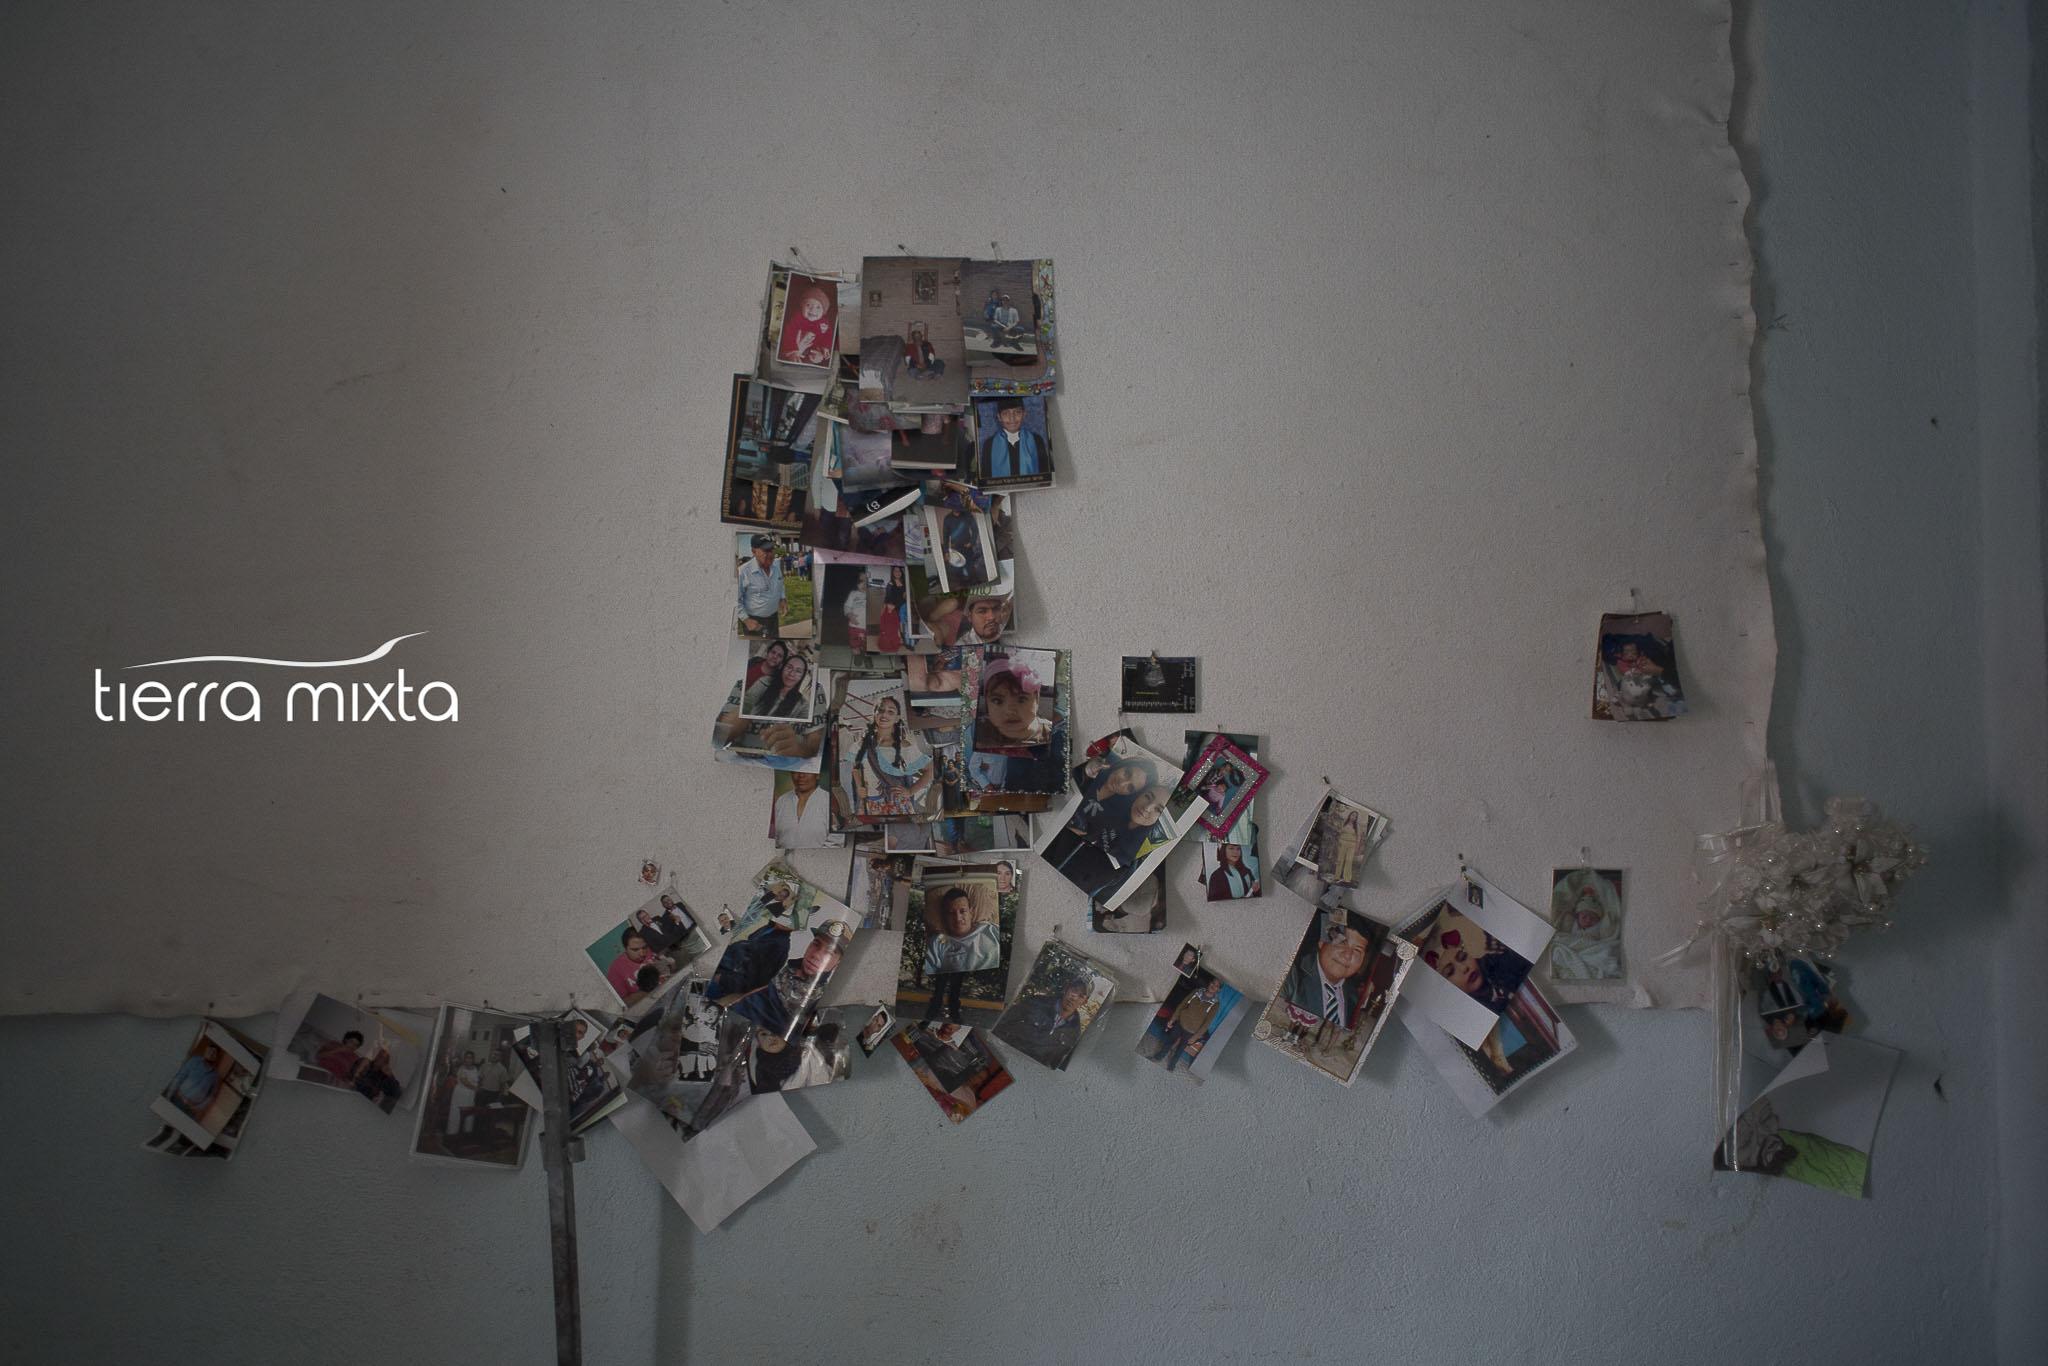 La Sauceda_Tierra Mixta_Cristian Herrera_2020__2